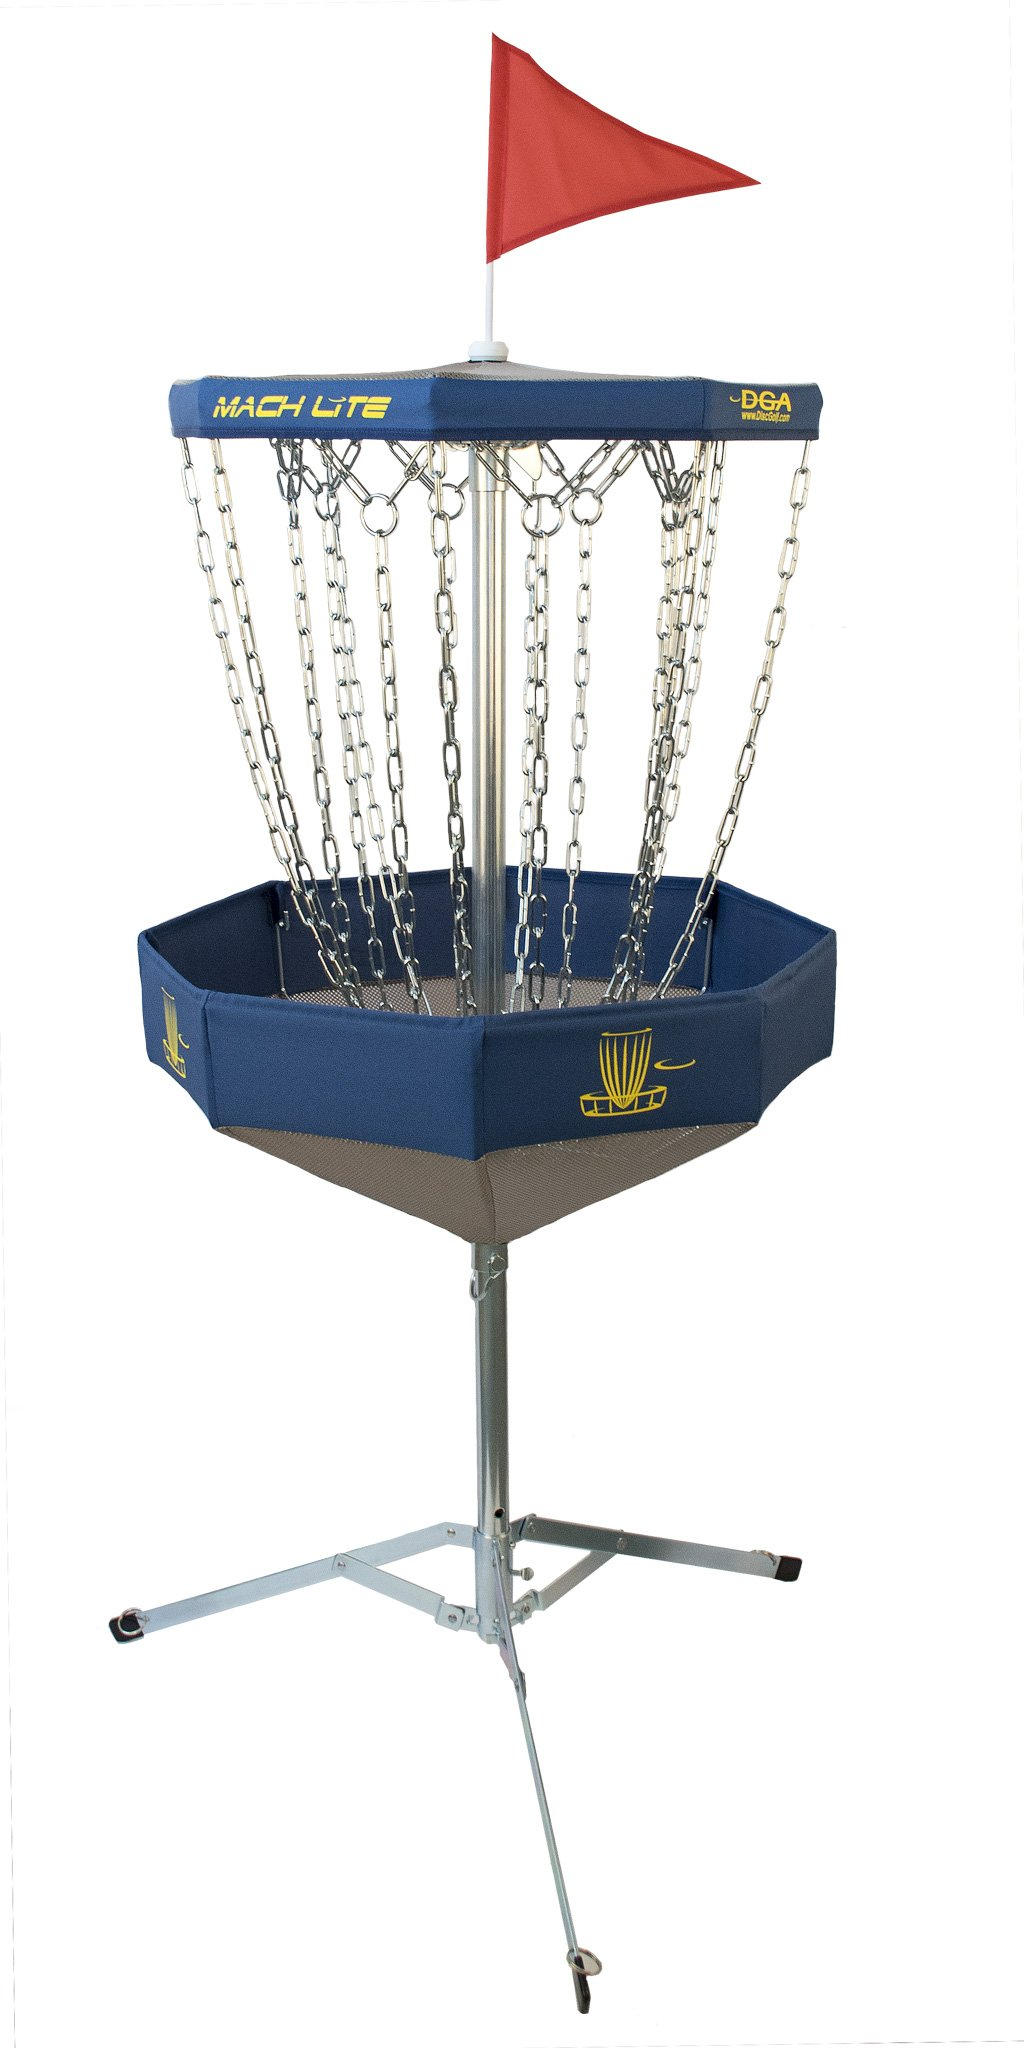 DGA Mach Lite Portable Disc Golf Practice Basket (Blue)